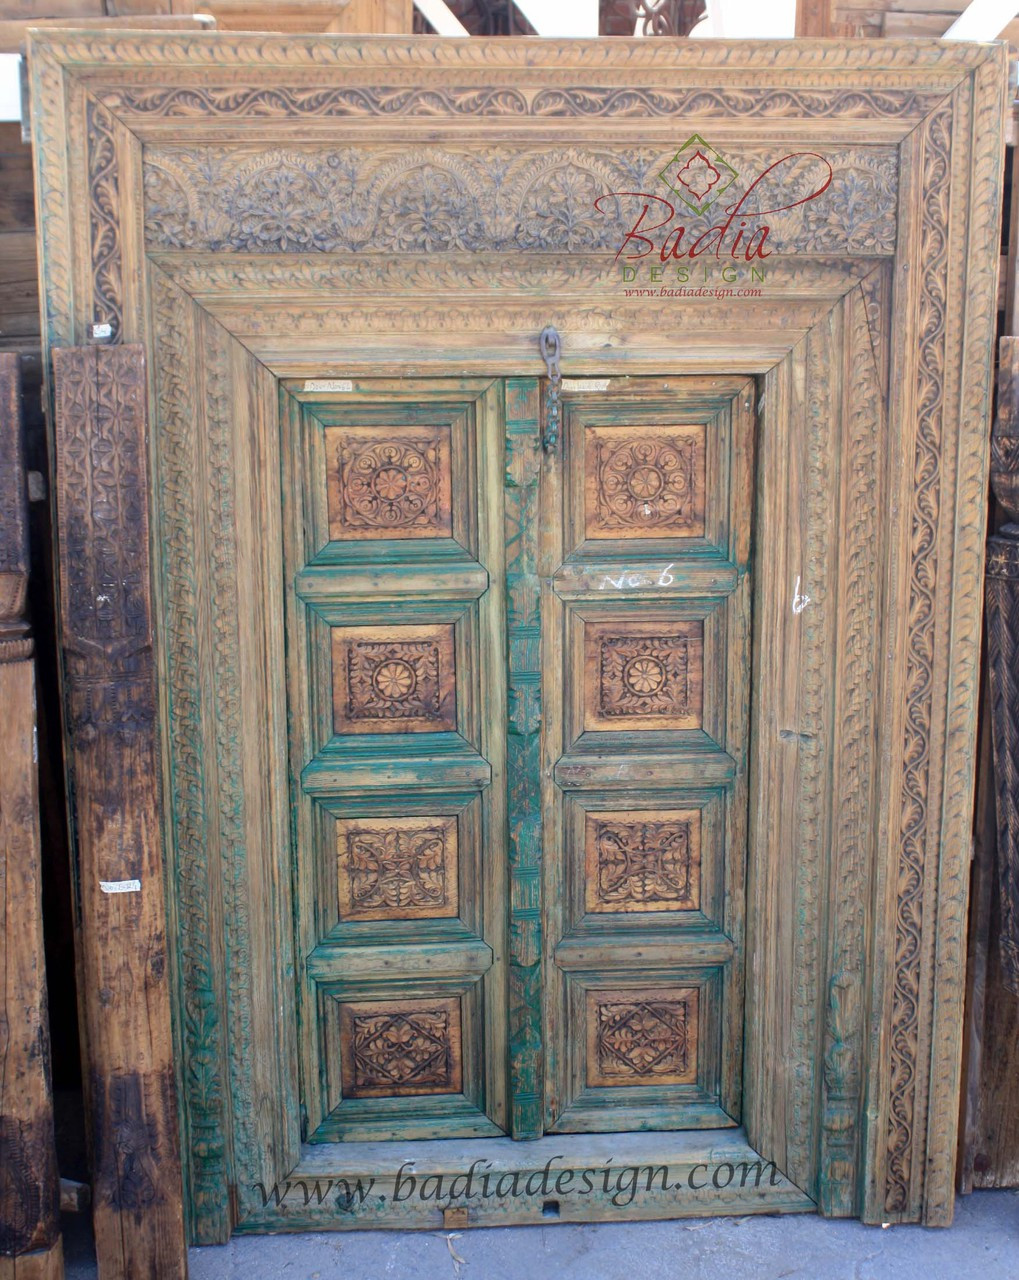 Vintage Hand Carved Wooden Door from Badia Design Inc.